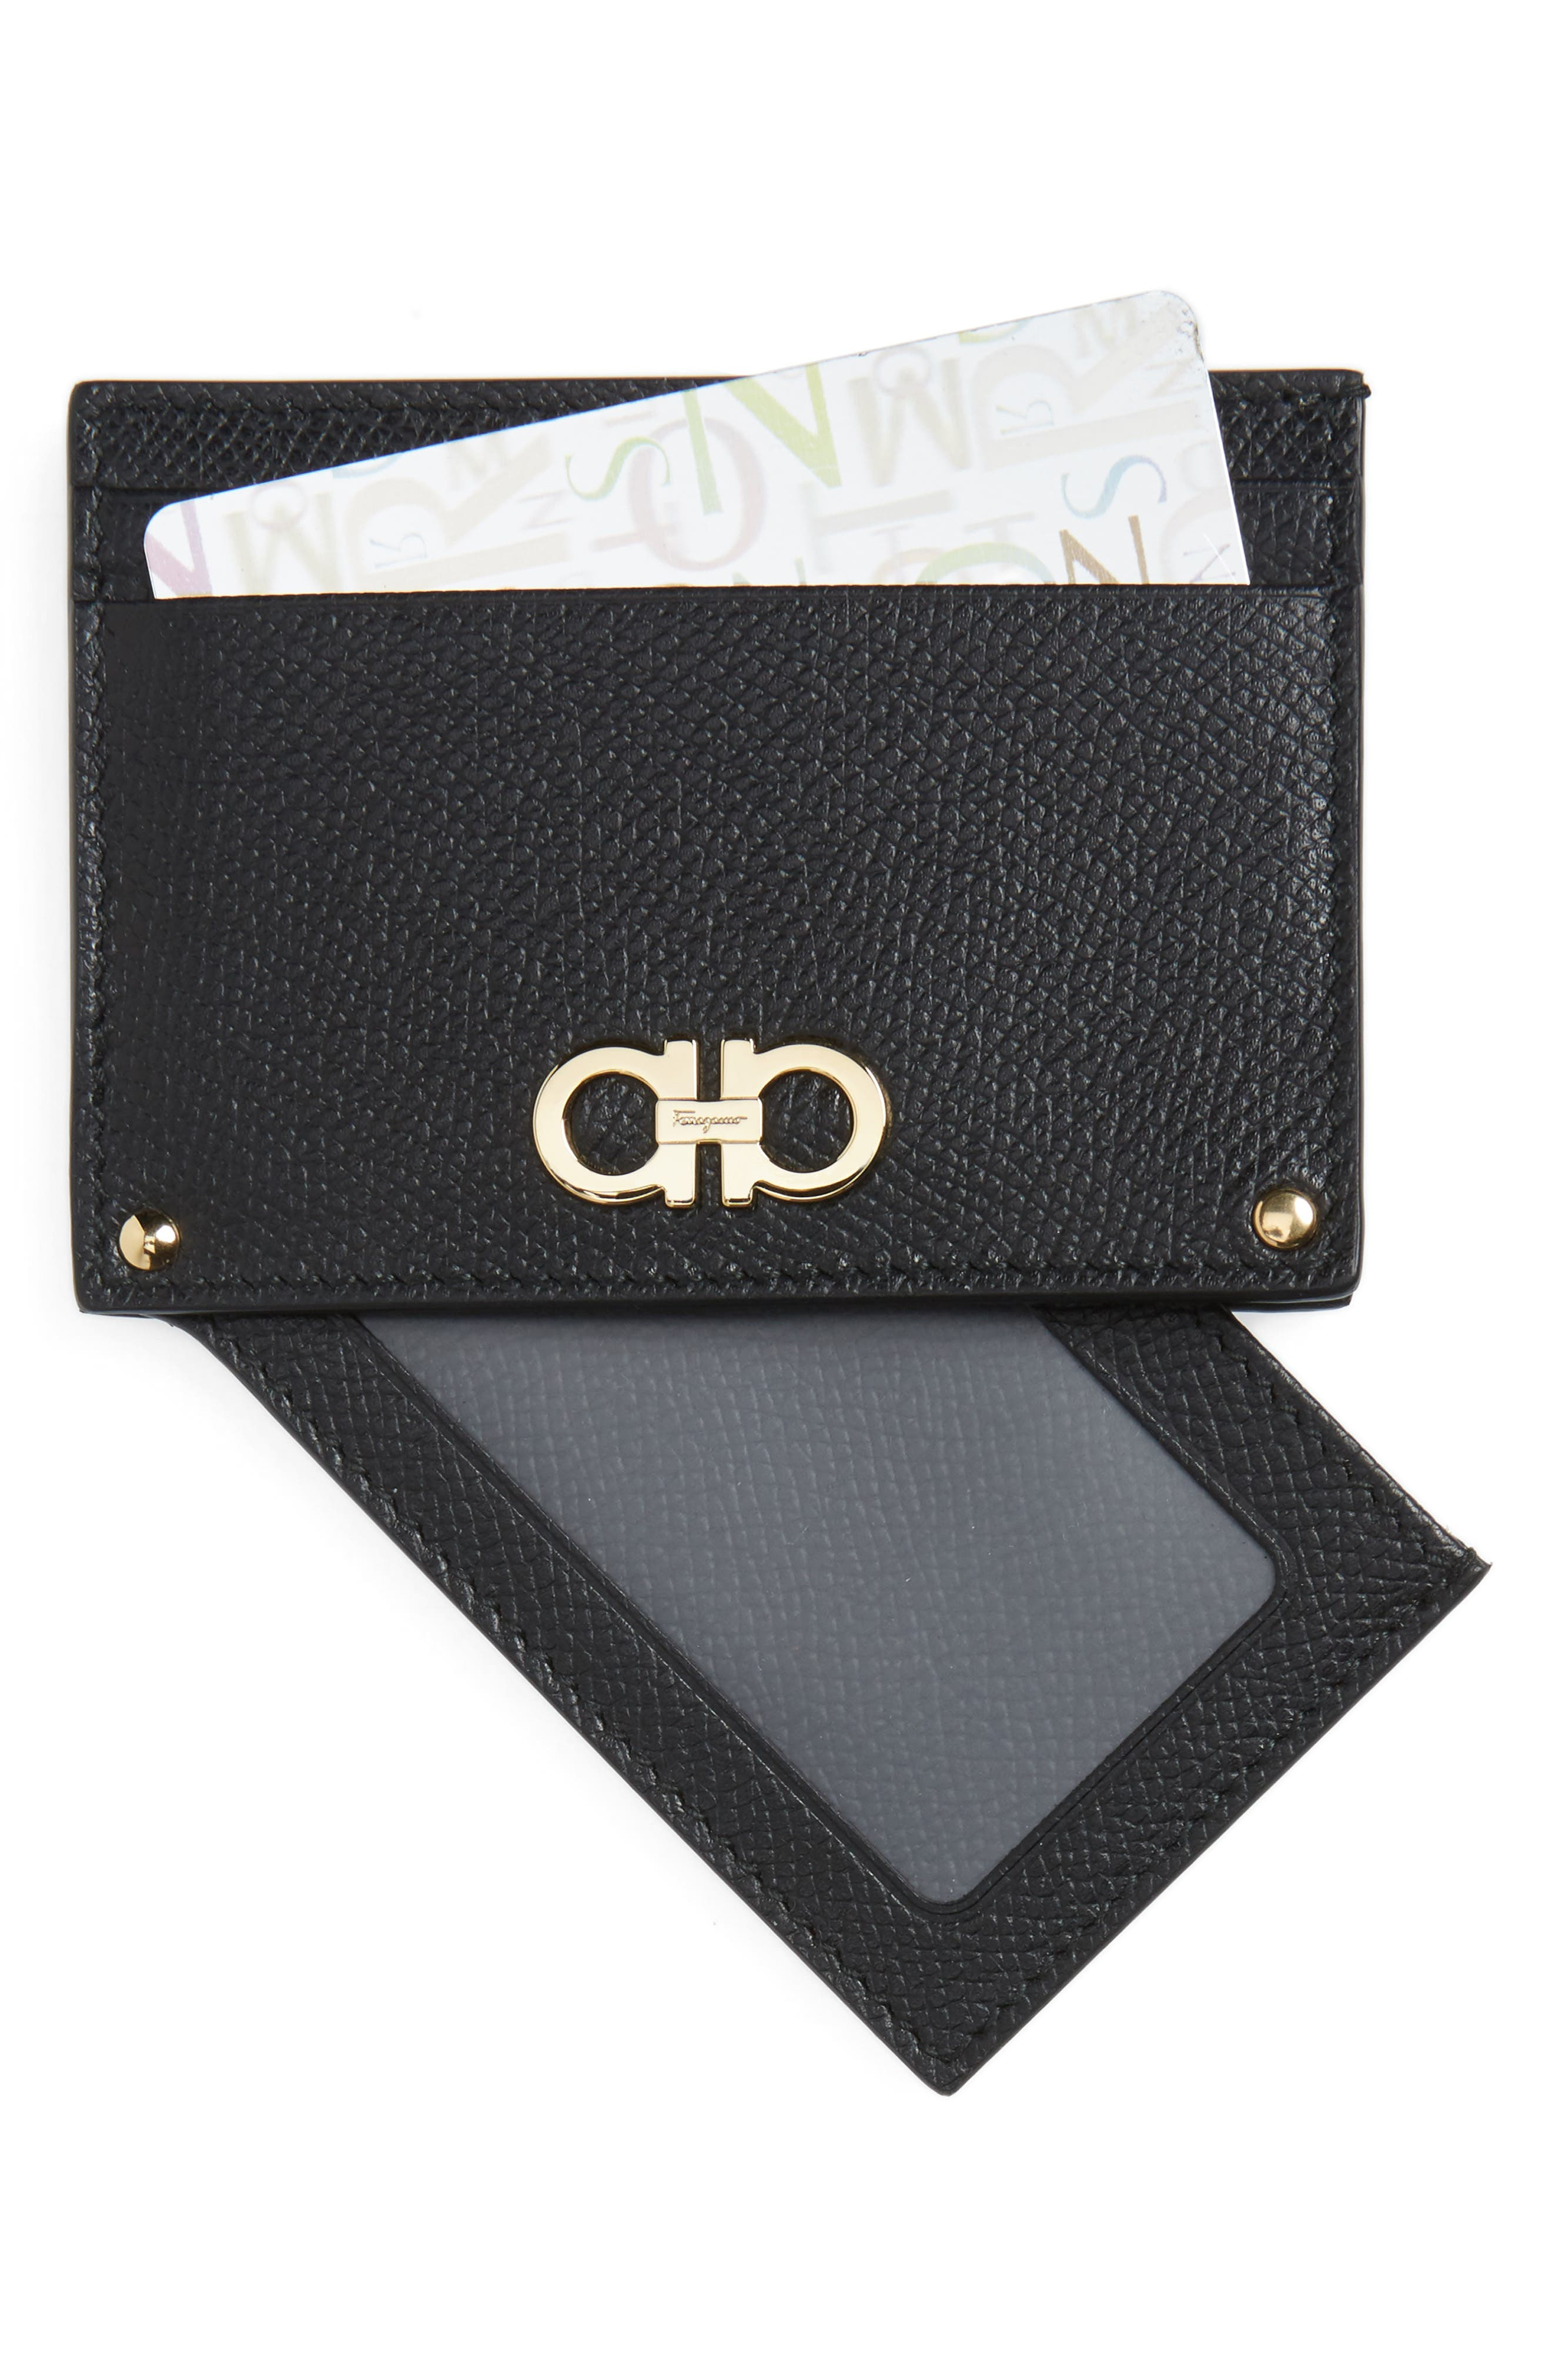 Main Image - Salvatore Ferragamo Gancio Leather Card Case